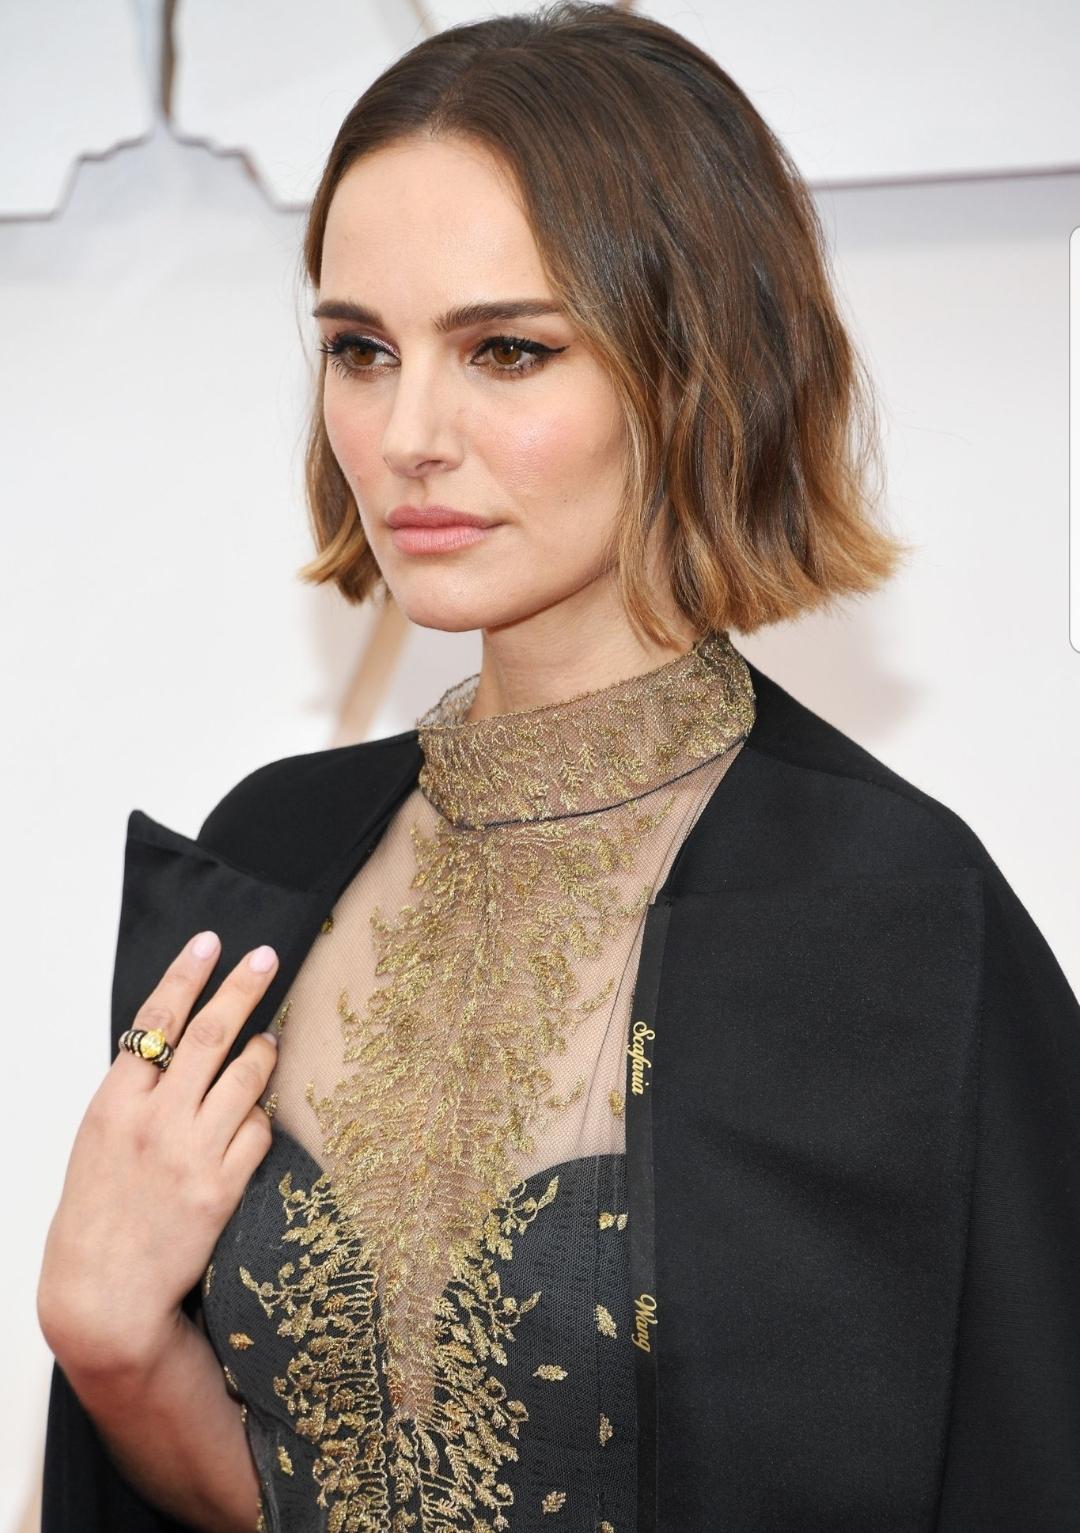 Oscars 2020: Natalie Portman Pays Homage to the Unacknowledged Female Directors - Masala.com